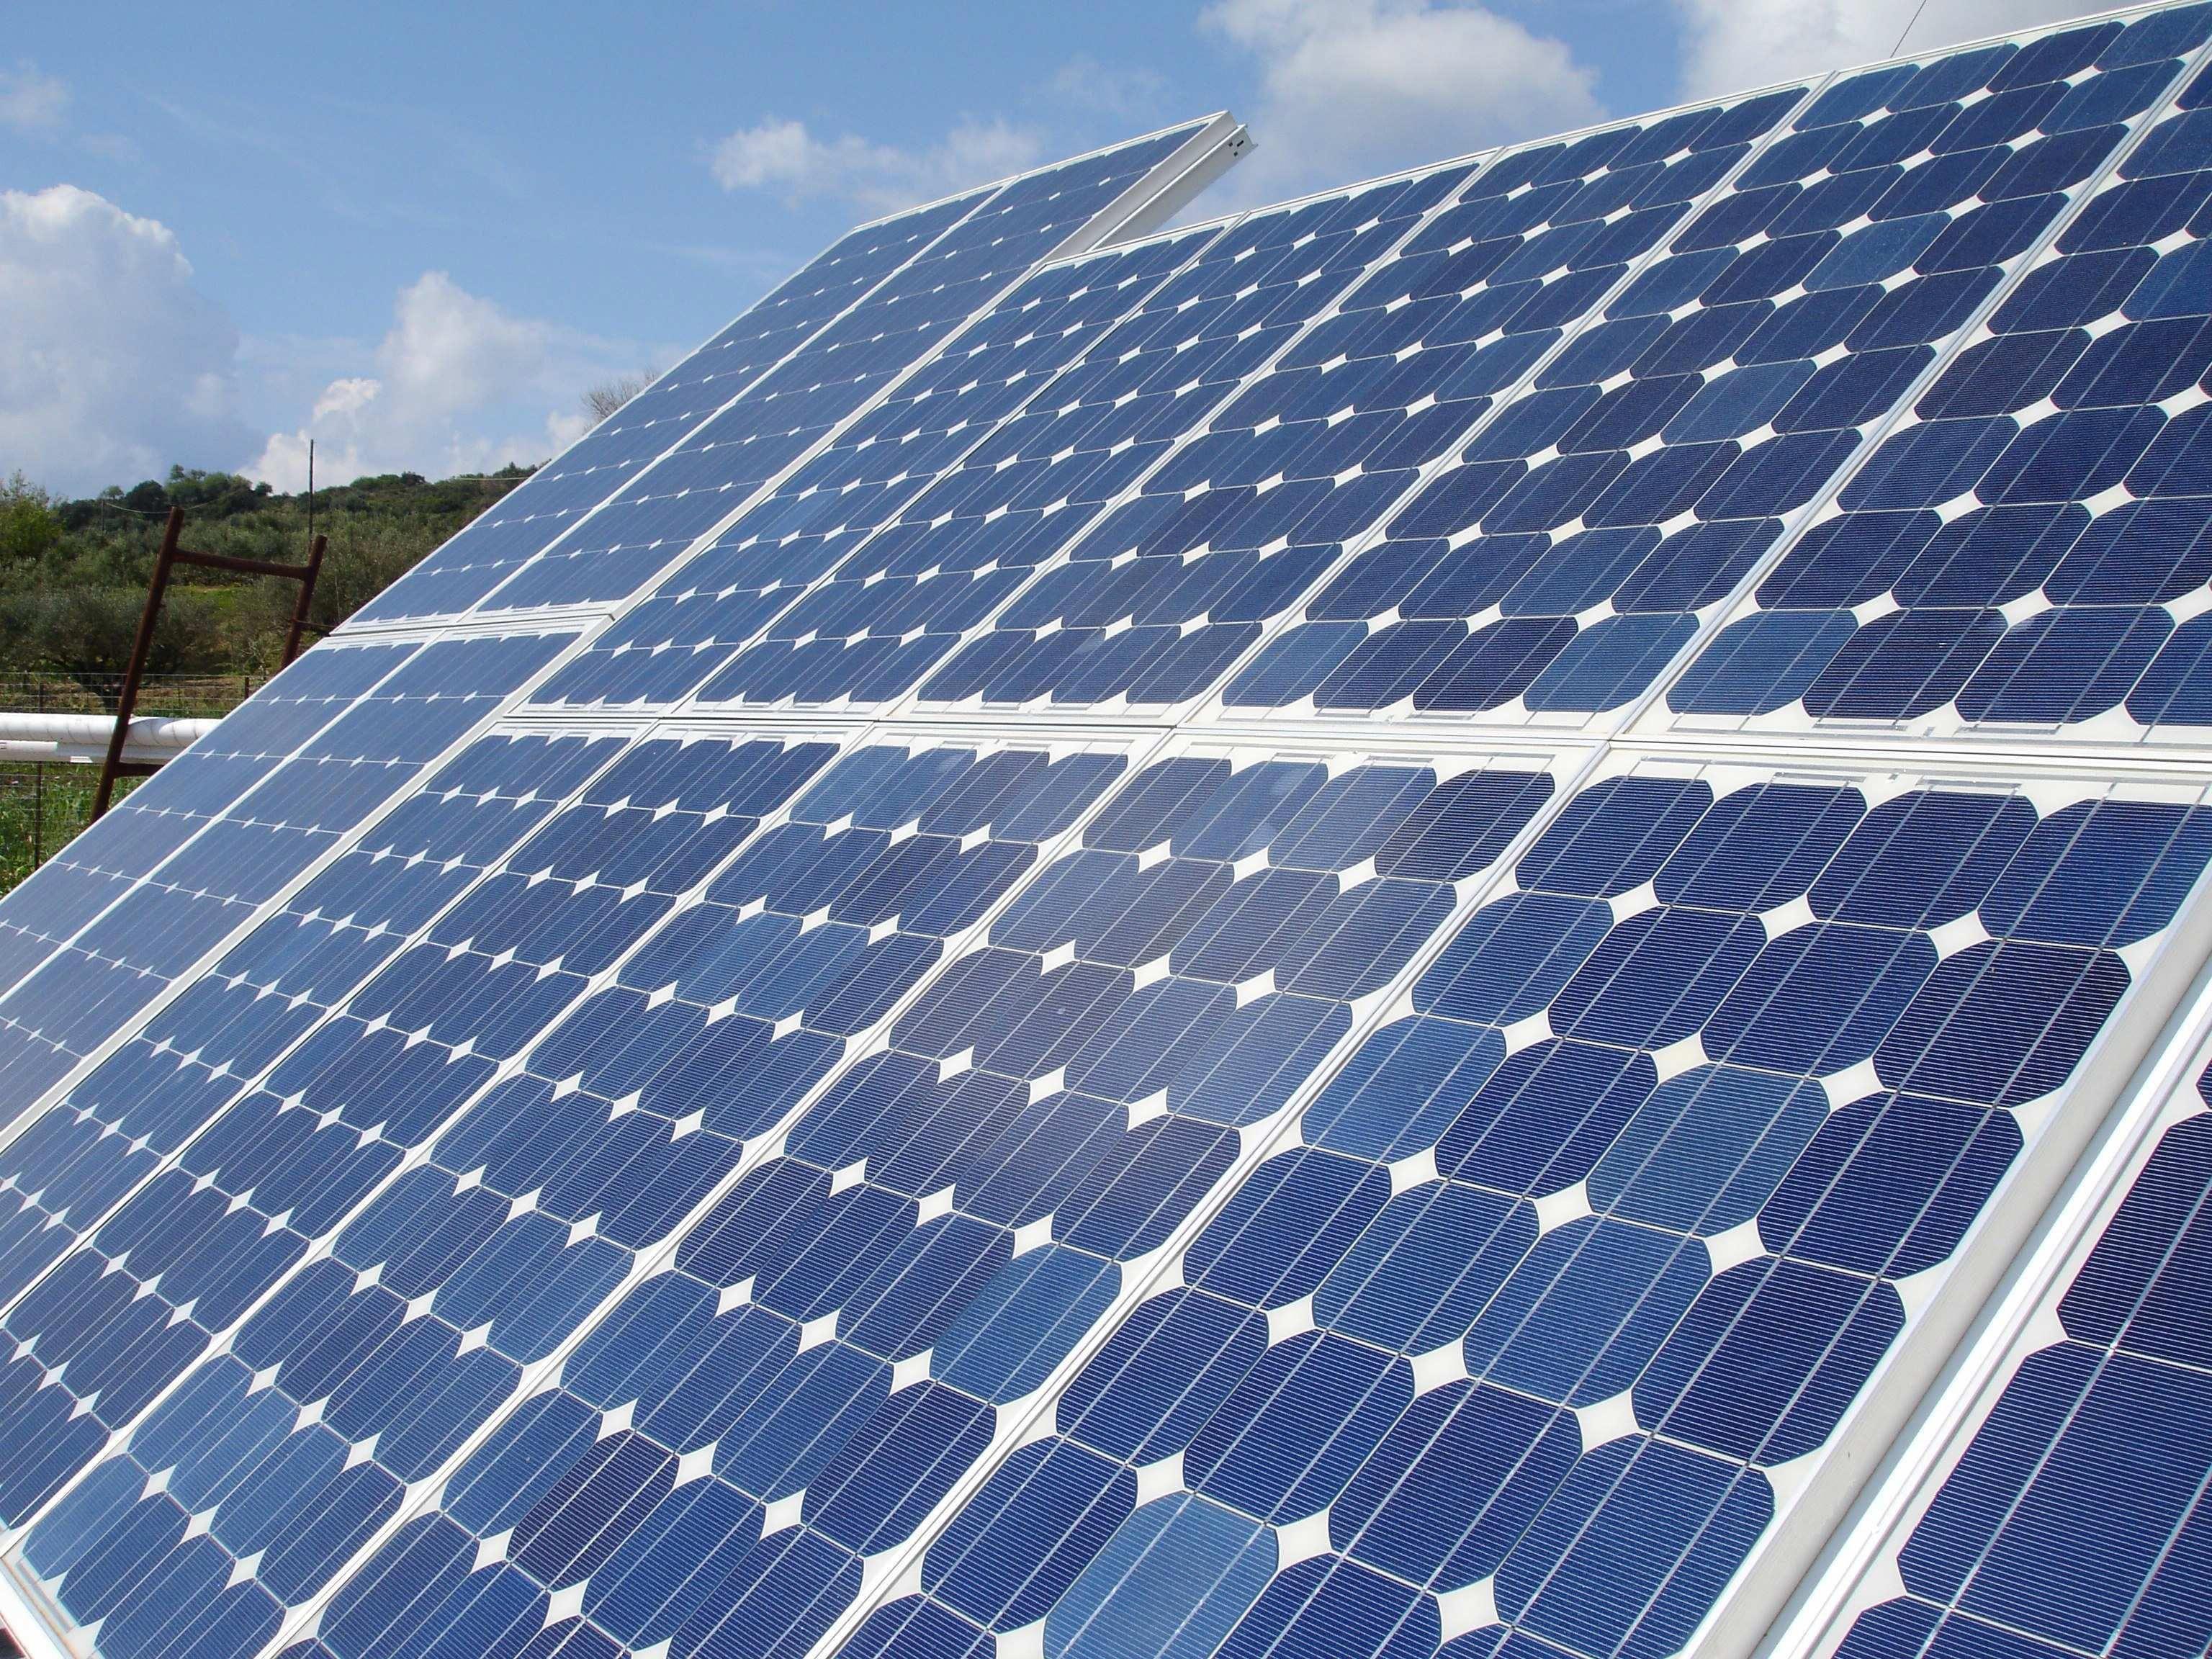 Best Solar Panels For Home Use Solar Panels Solar Energy Diy Solar Farm